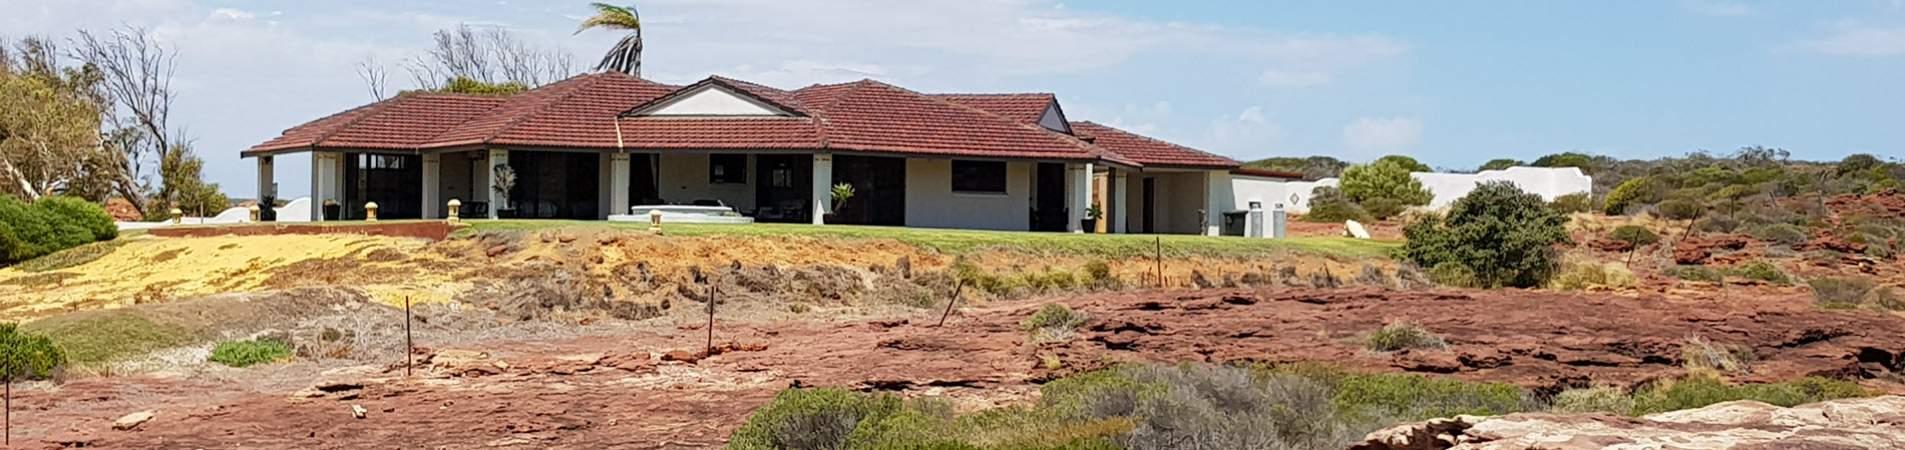 kalbarri accommodation wittecarra beach house - banner 1